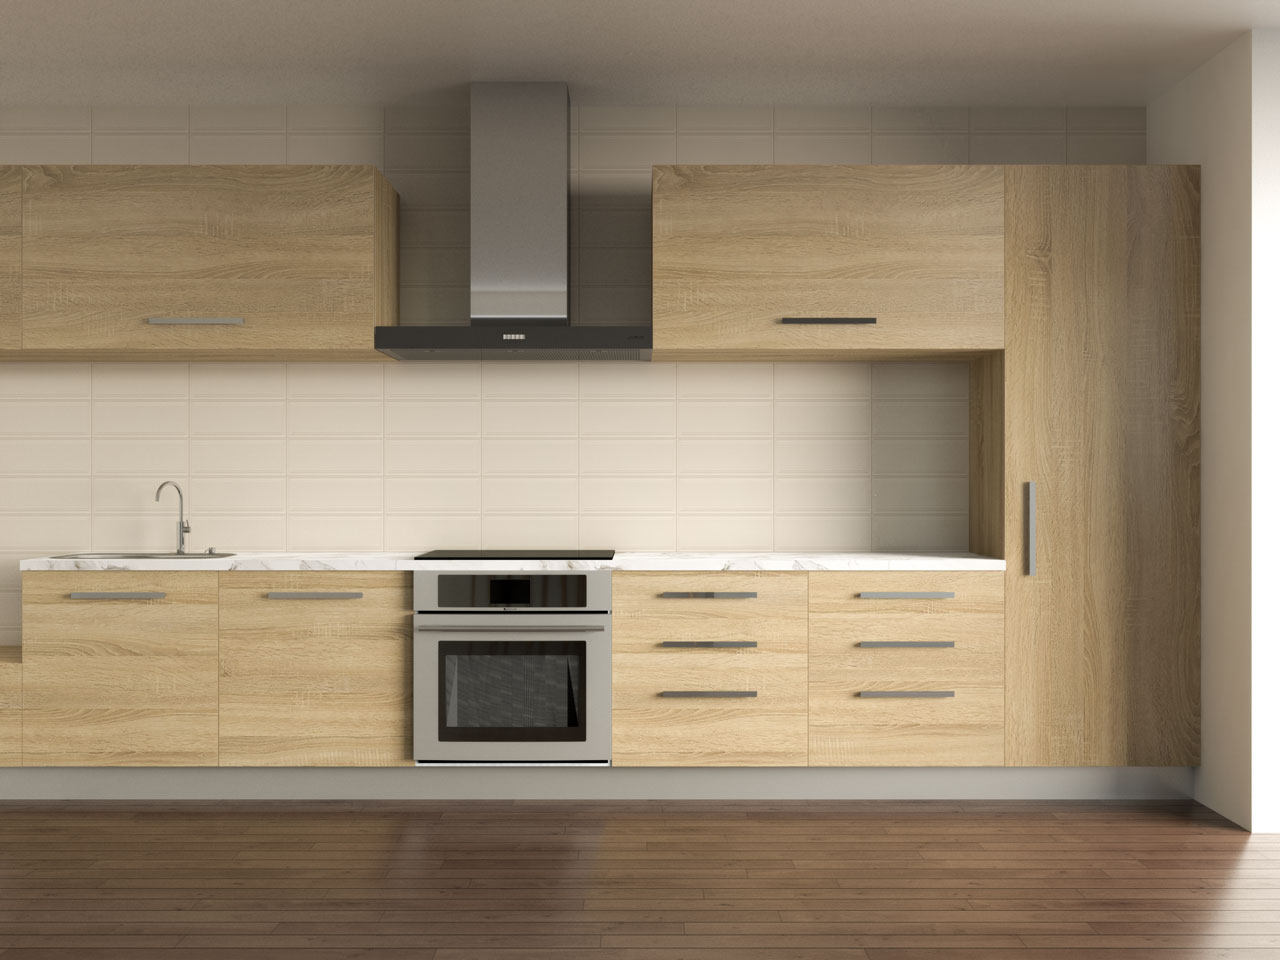 Almond backsplash with oak cabinets